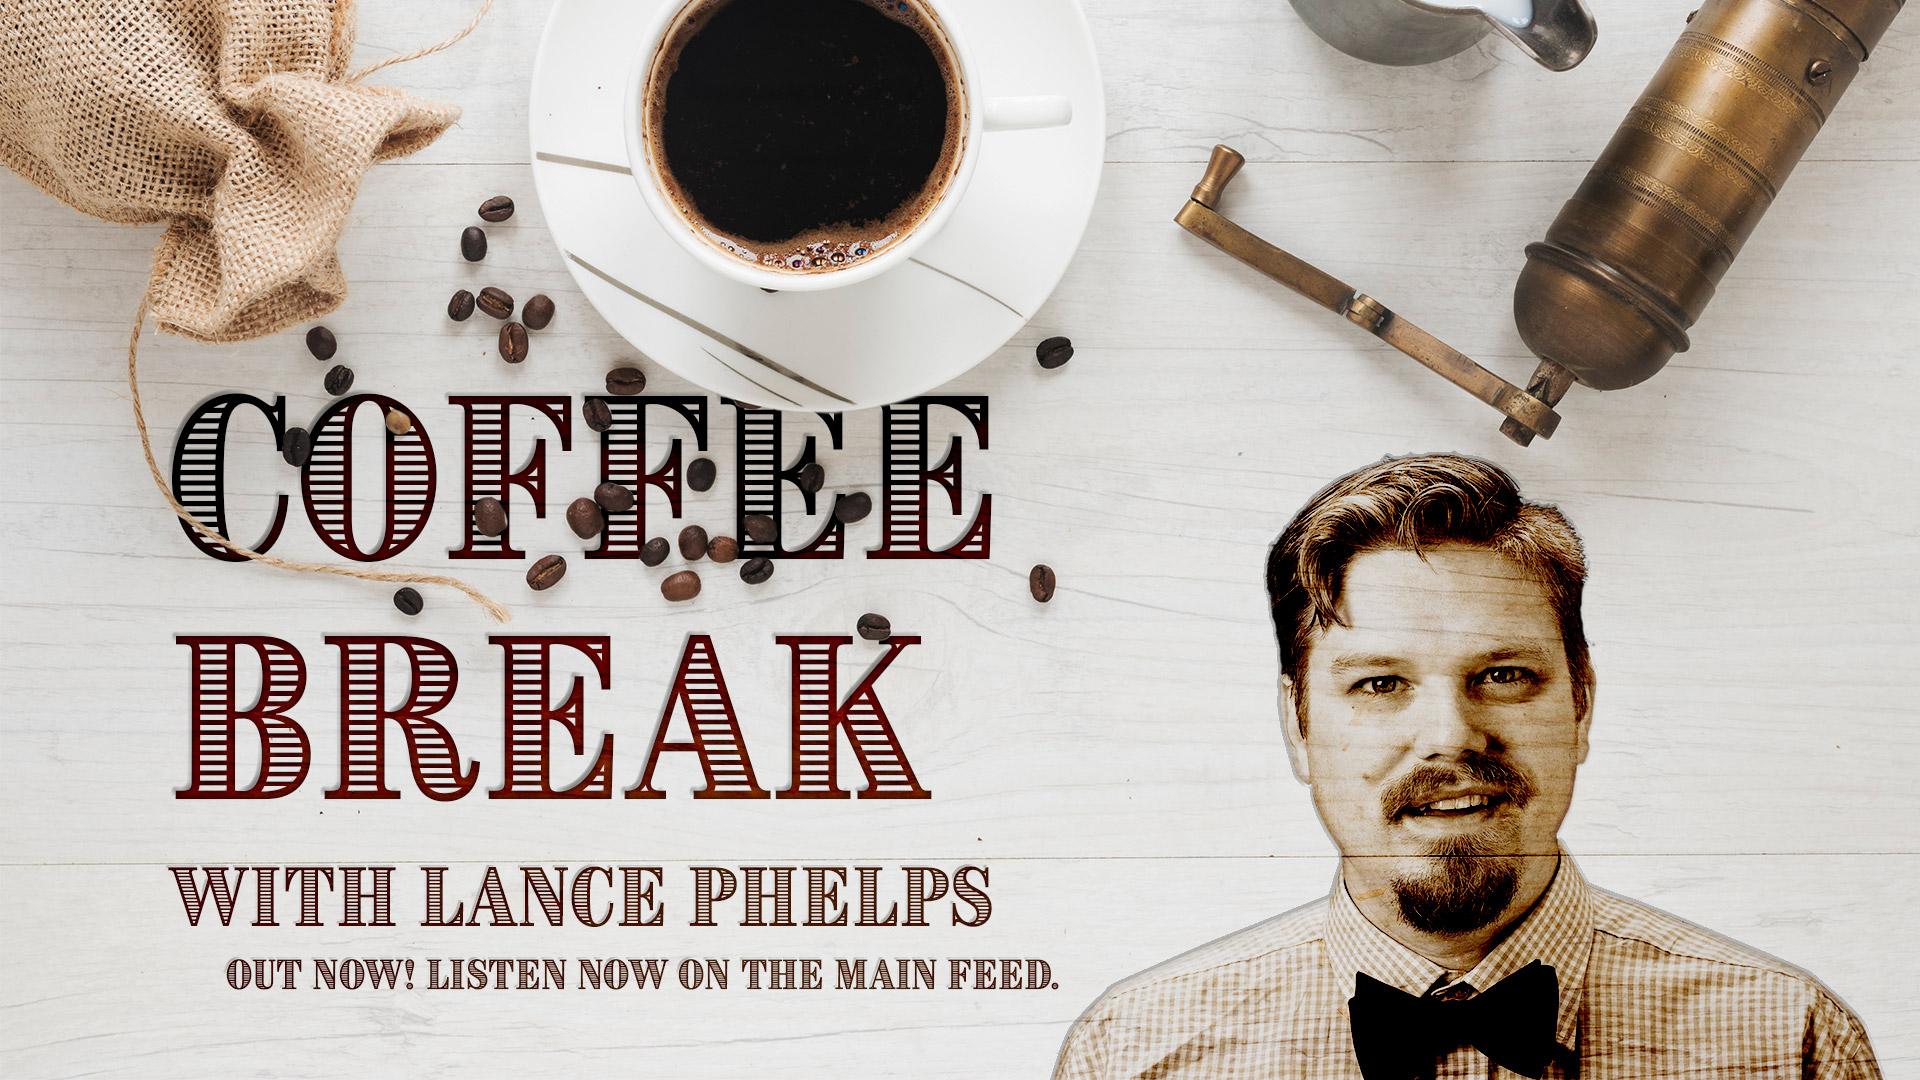 Coffee Break Ad - Artwork.jpg